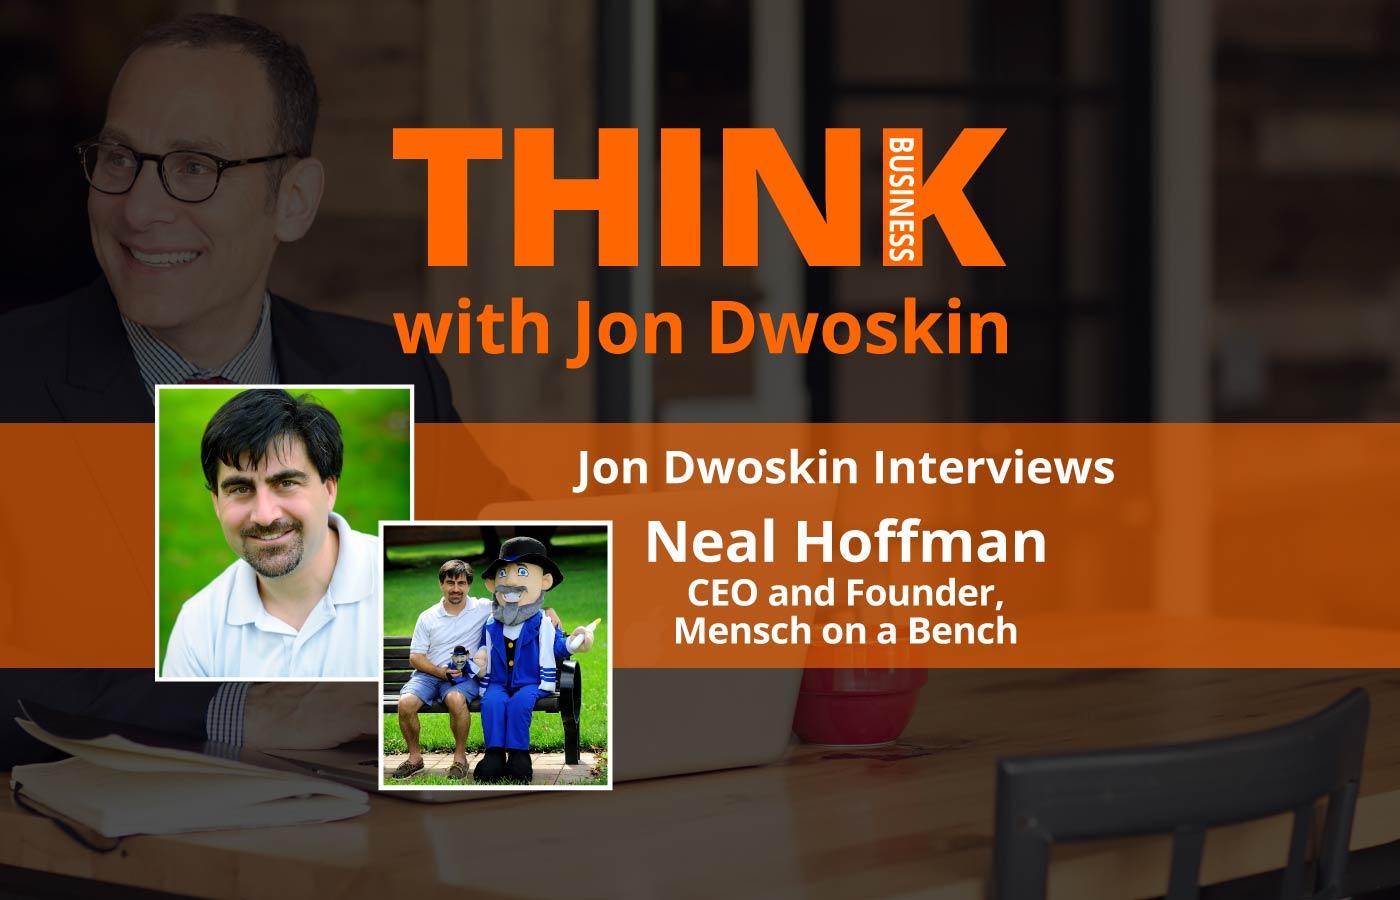 THINK Business: Jon Dwoskin Interviews Neal Hoffman, CEO and Founder, Mensch on a Bench